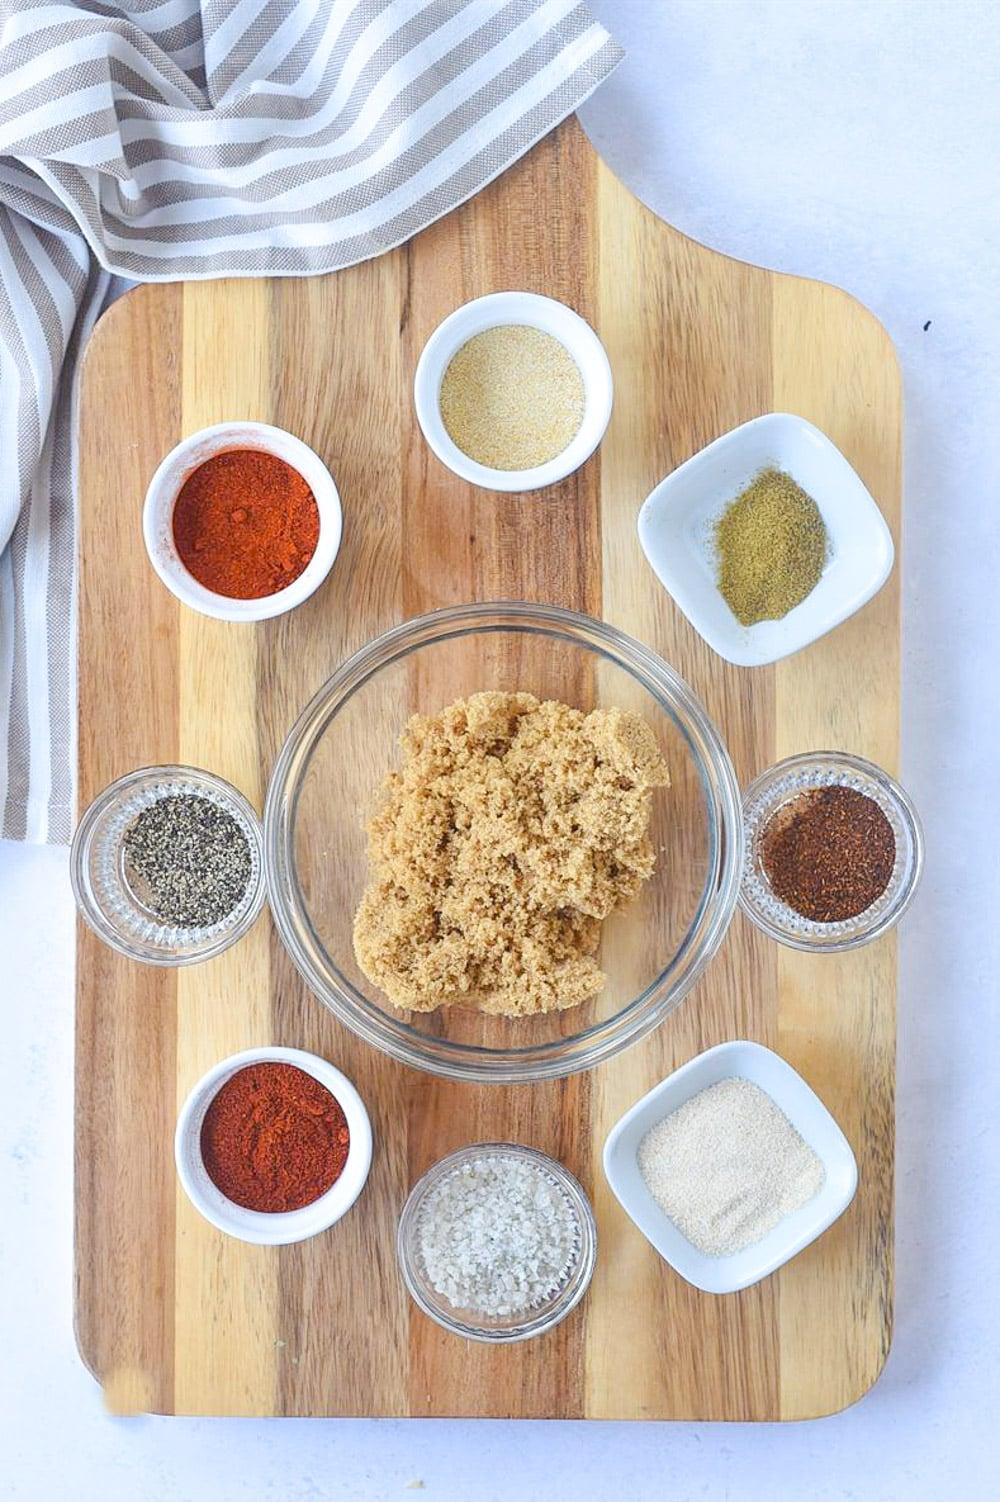 spice rub ingredients